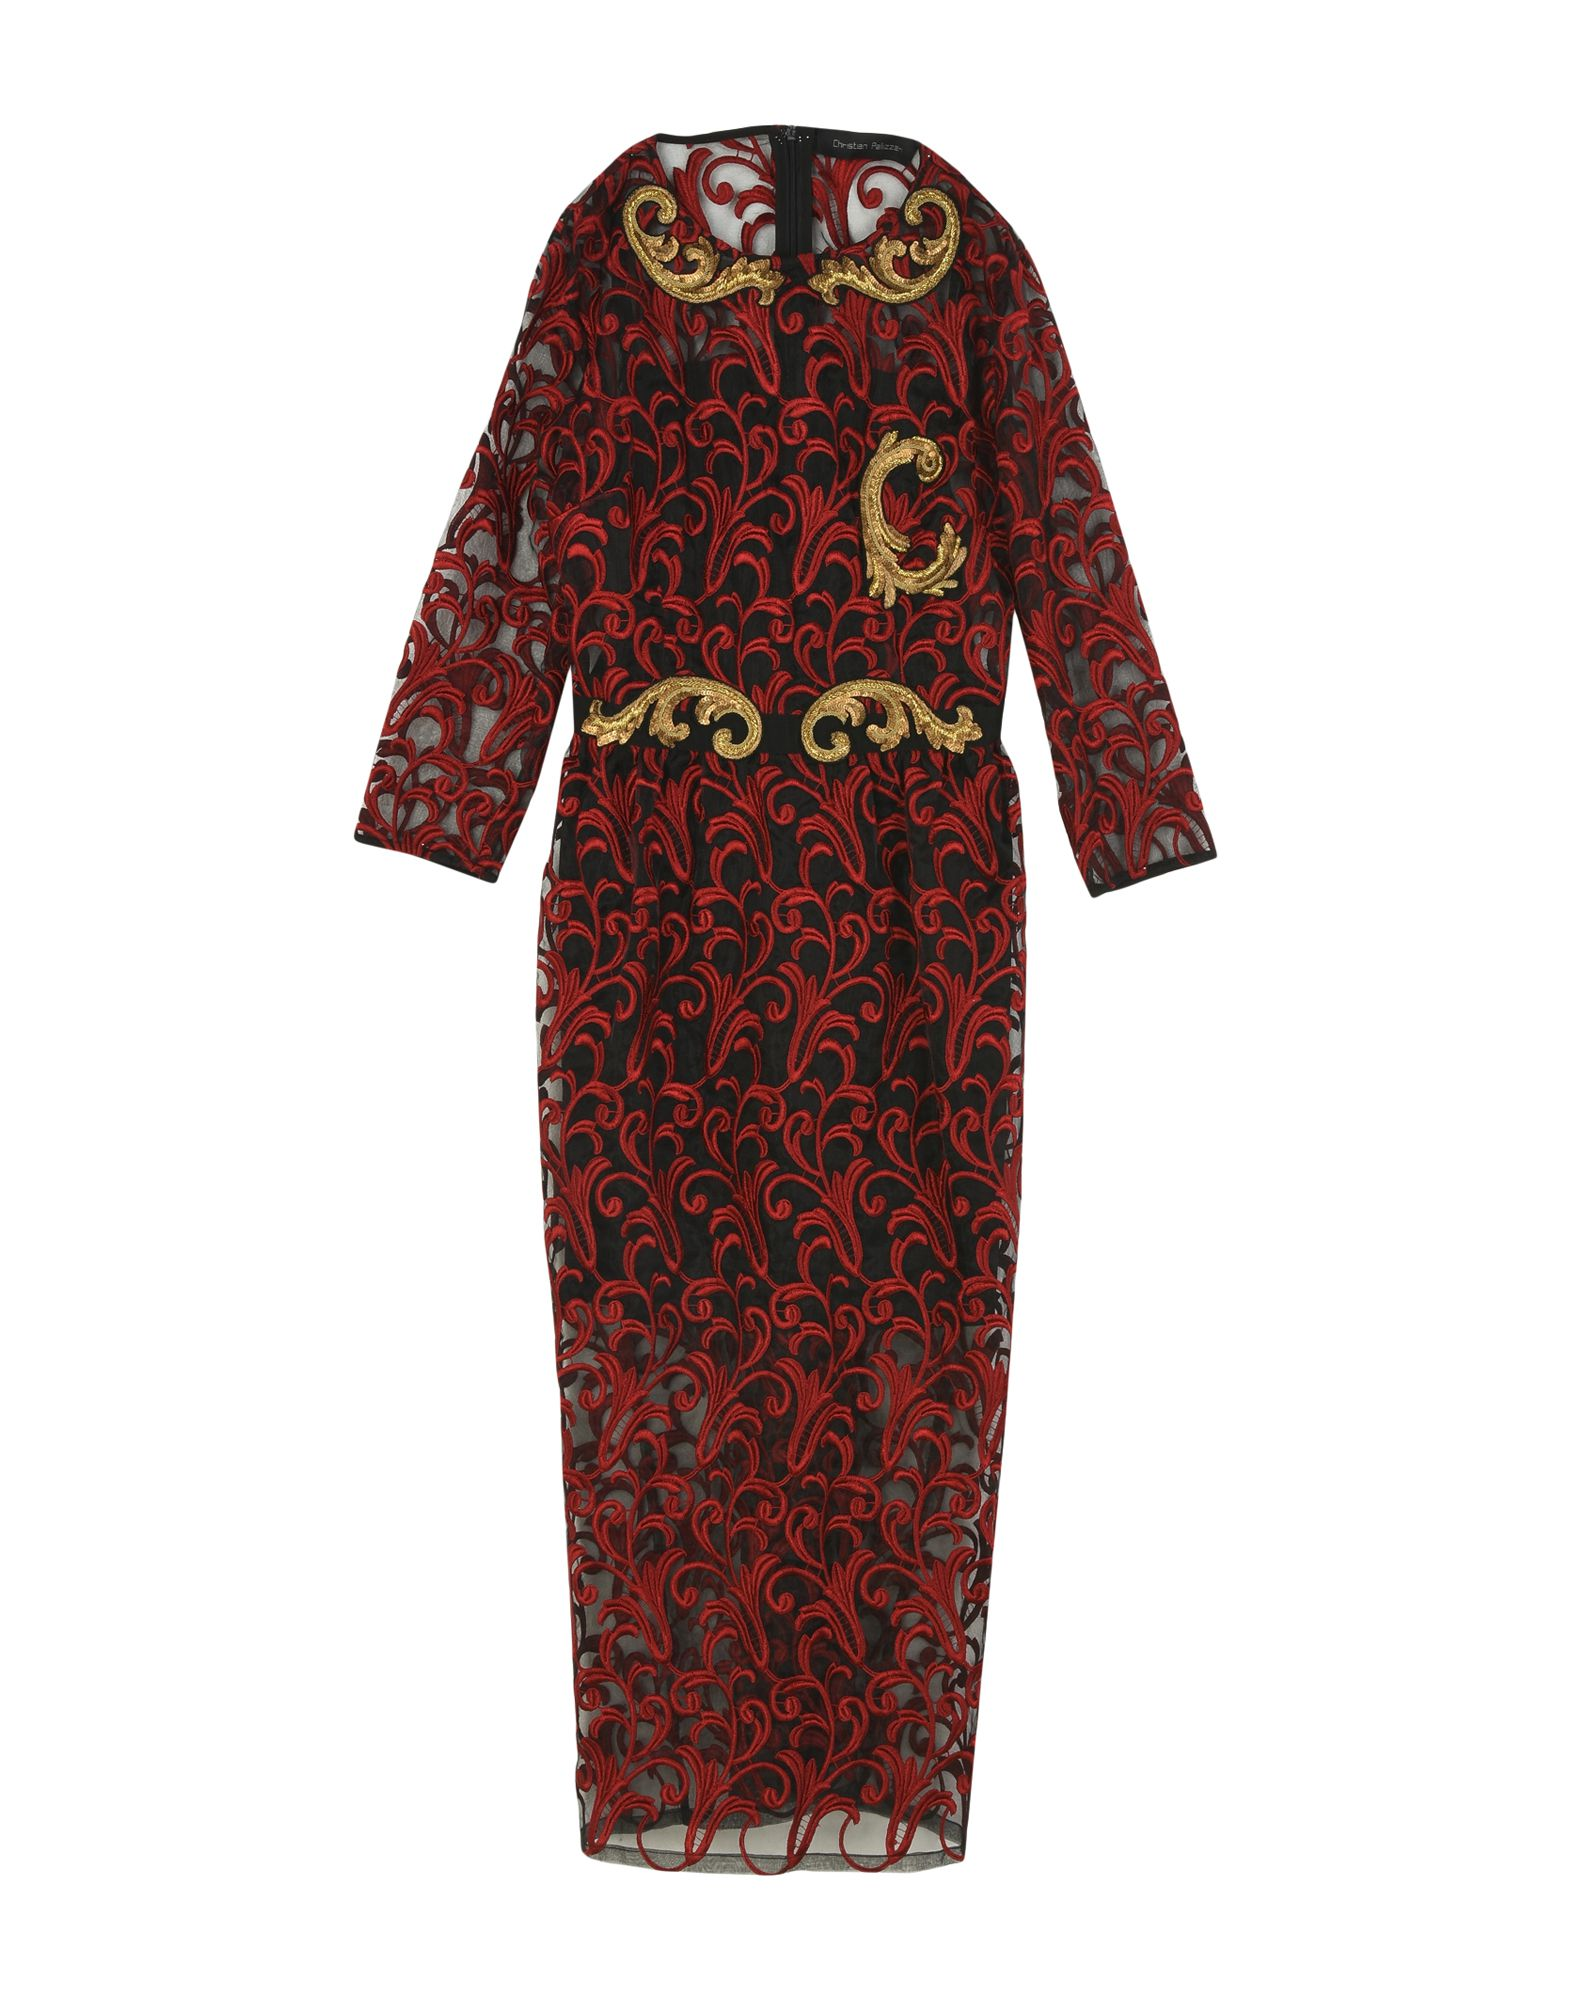 CHRISTIAN PELLIZZARI Платье длиной 3/4 christian pellizzari юбка длиной 3 4